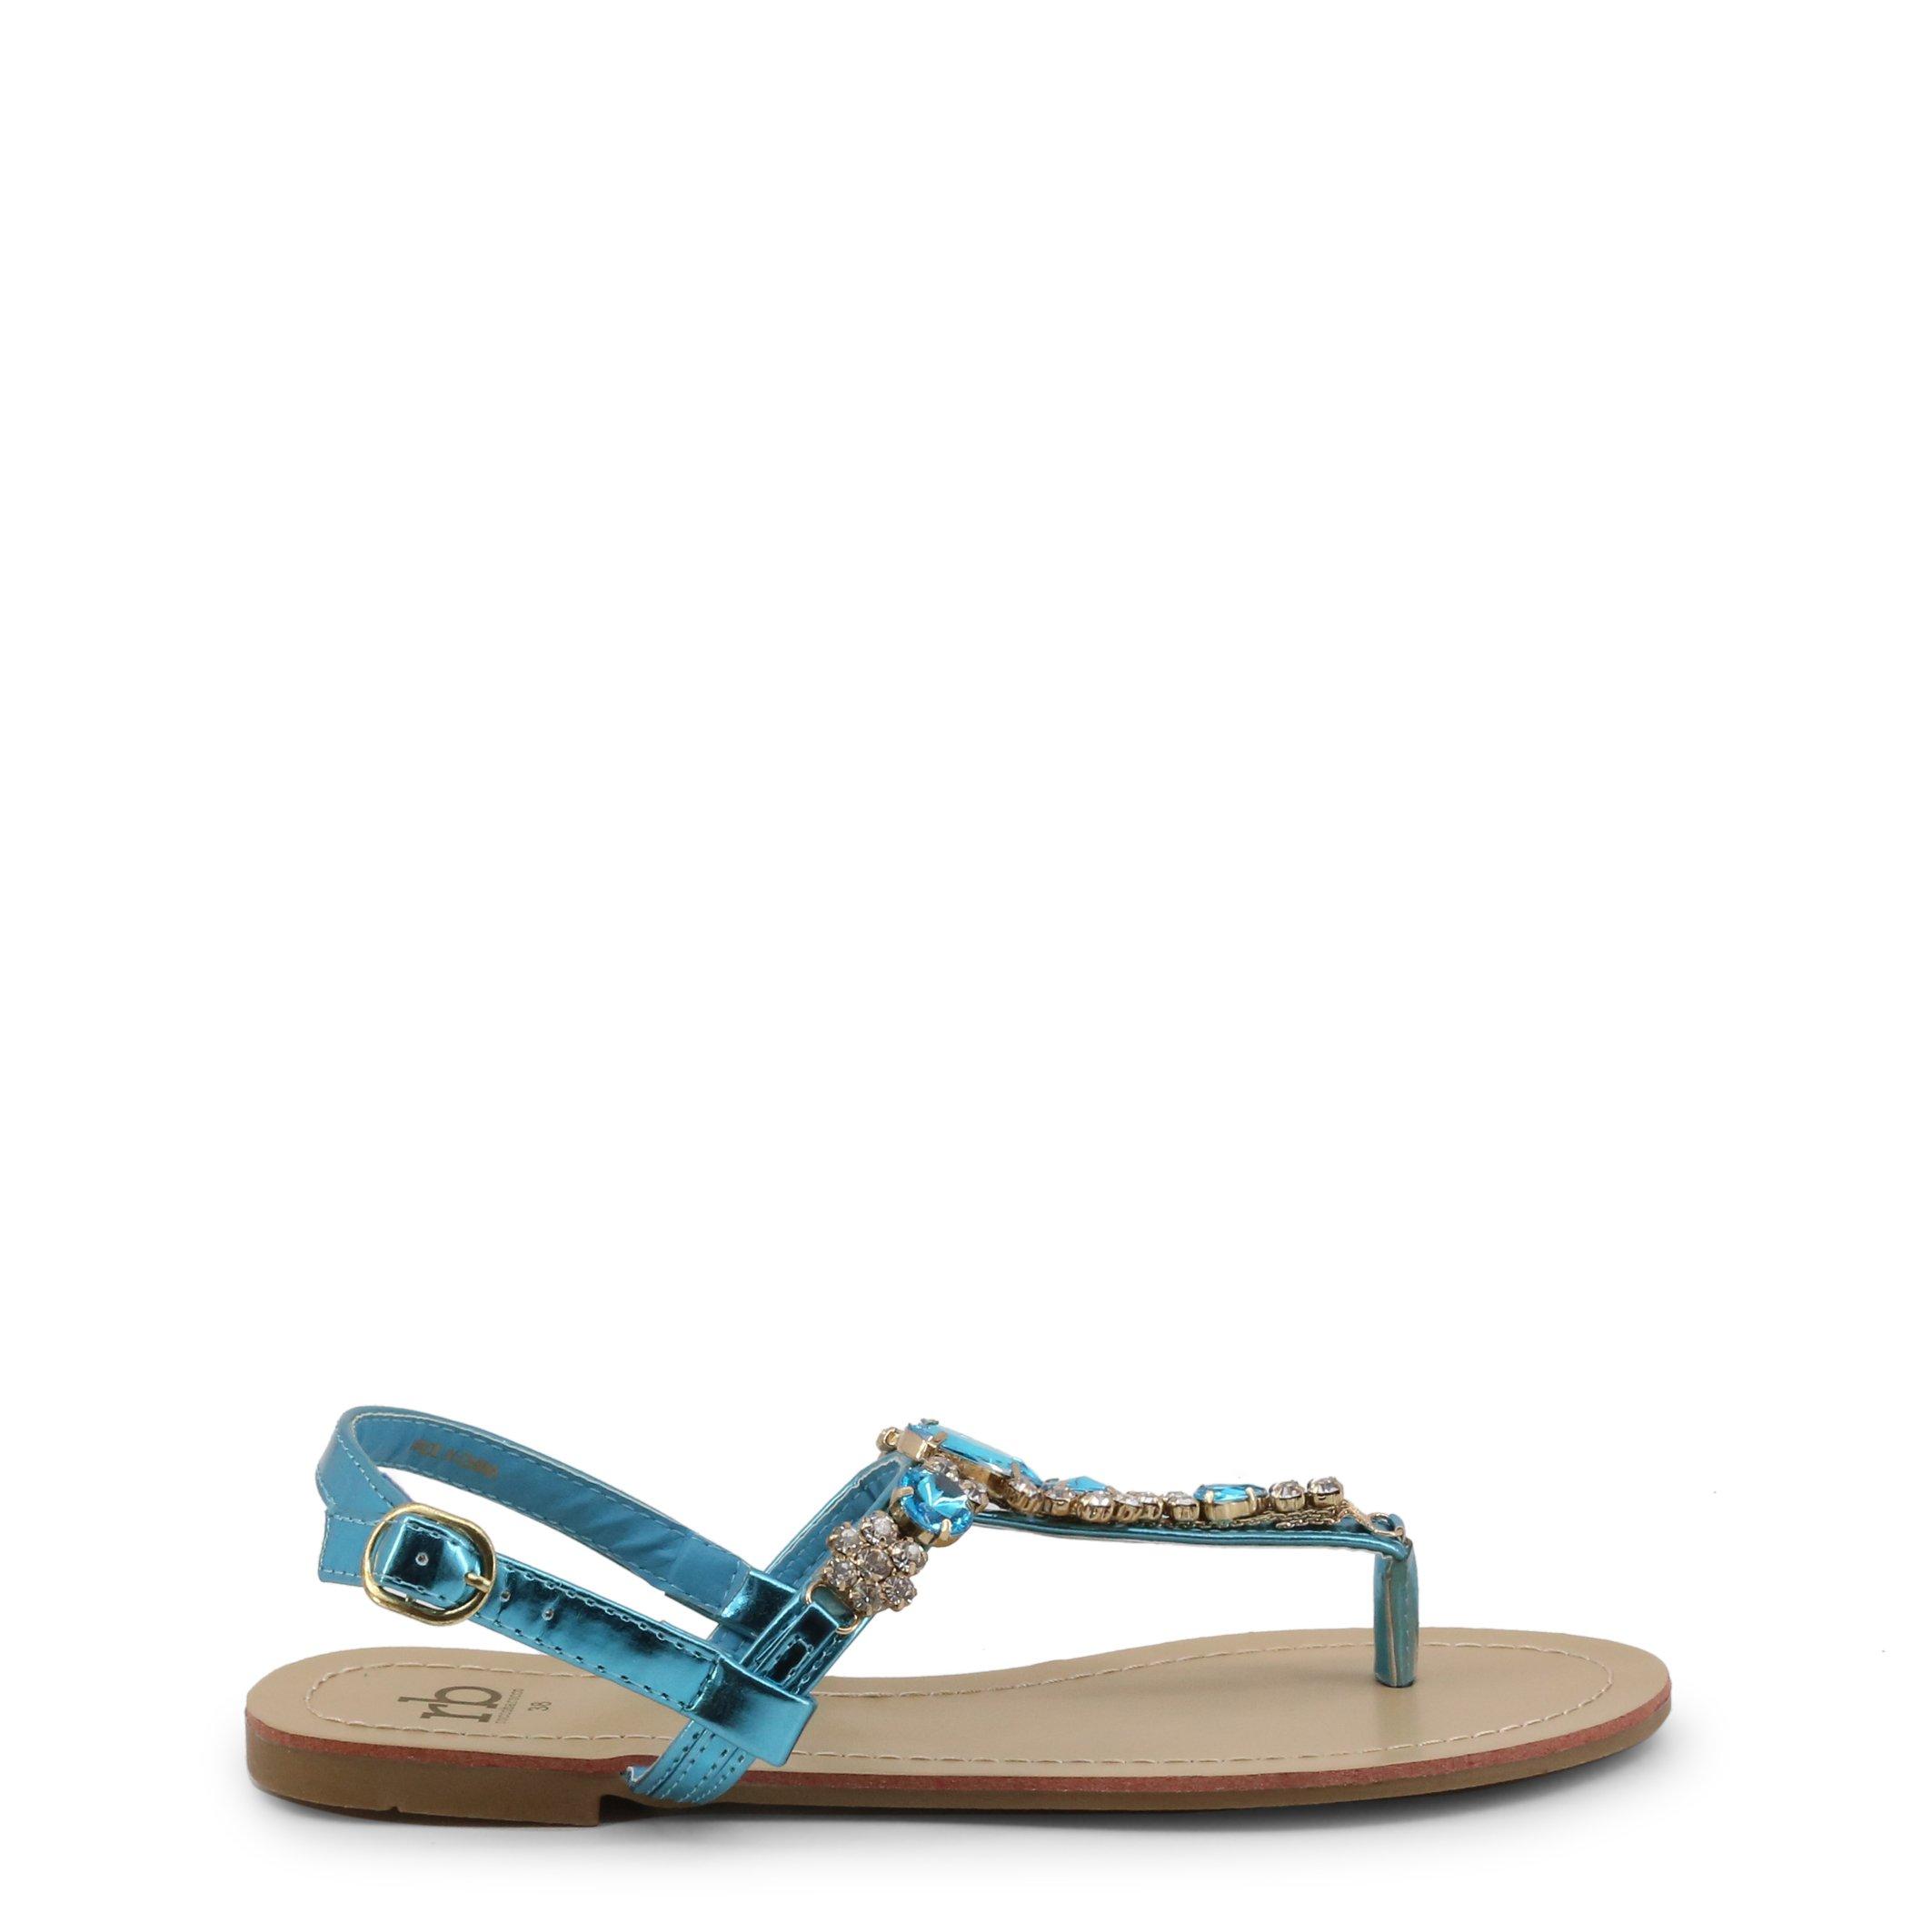 Roccobarocco Women's Sandal Black RBSC1BP02 - blue EU 38